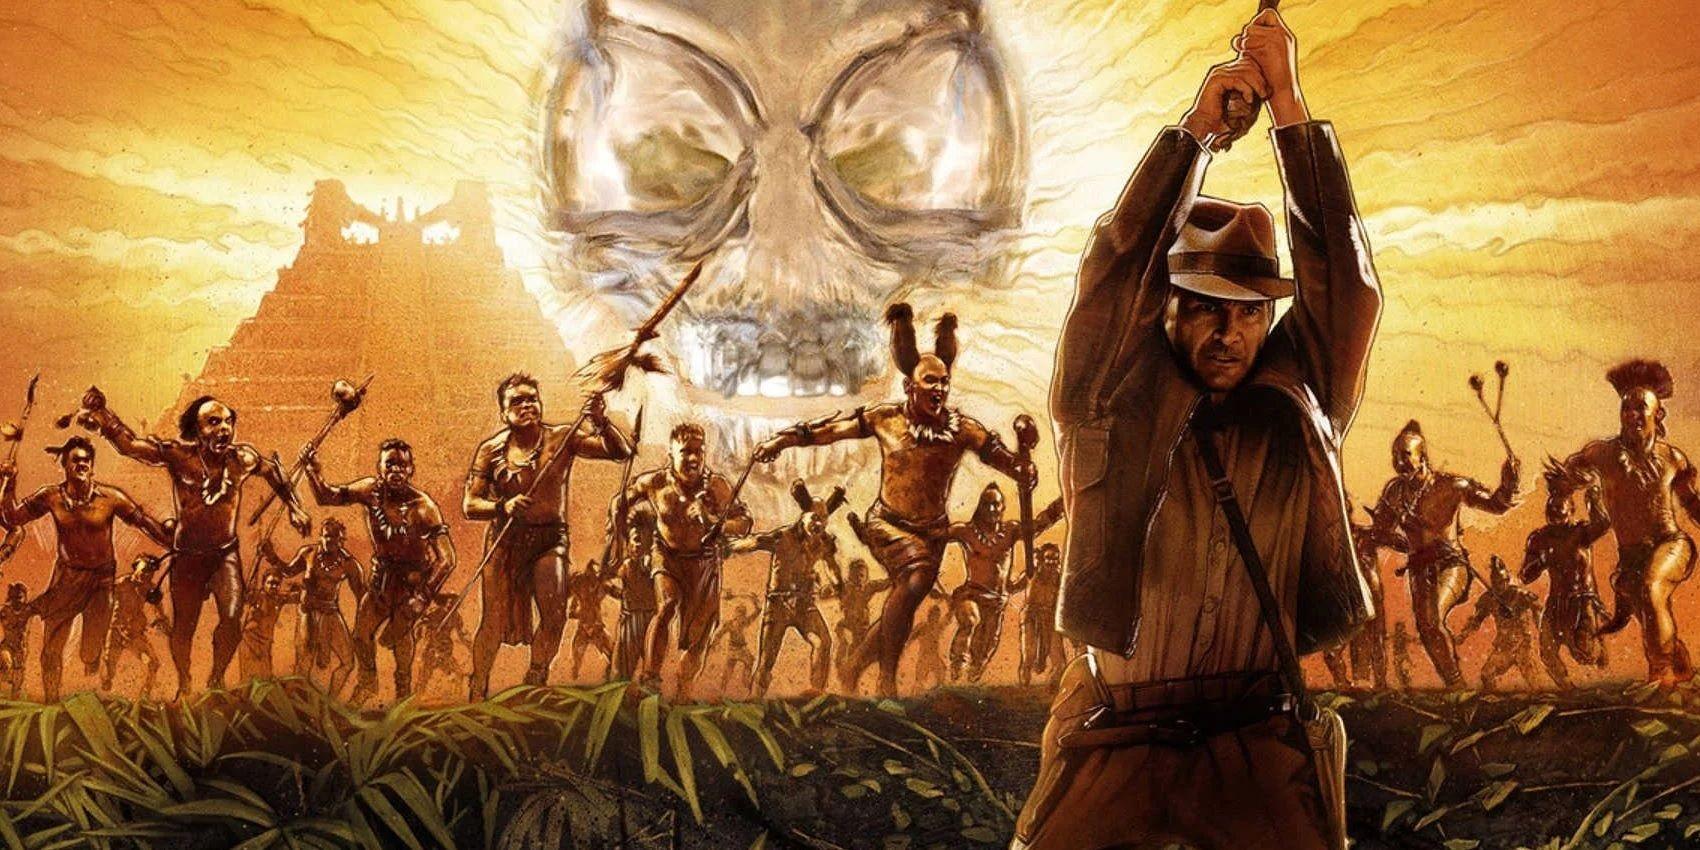 Indiana Jones 5 Will Inevitably Repeat Crystal Skull's Biggest Problem